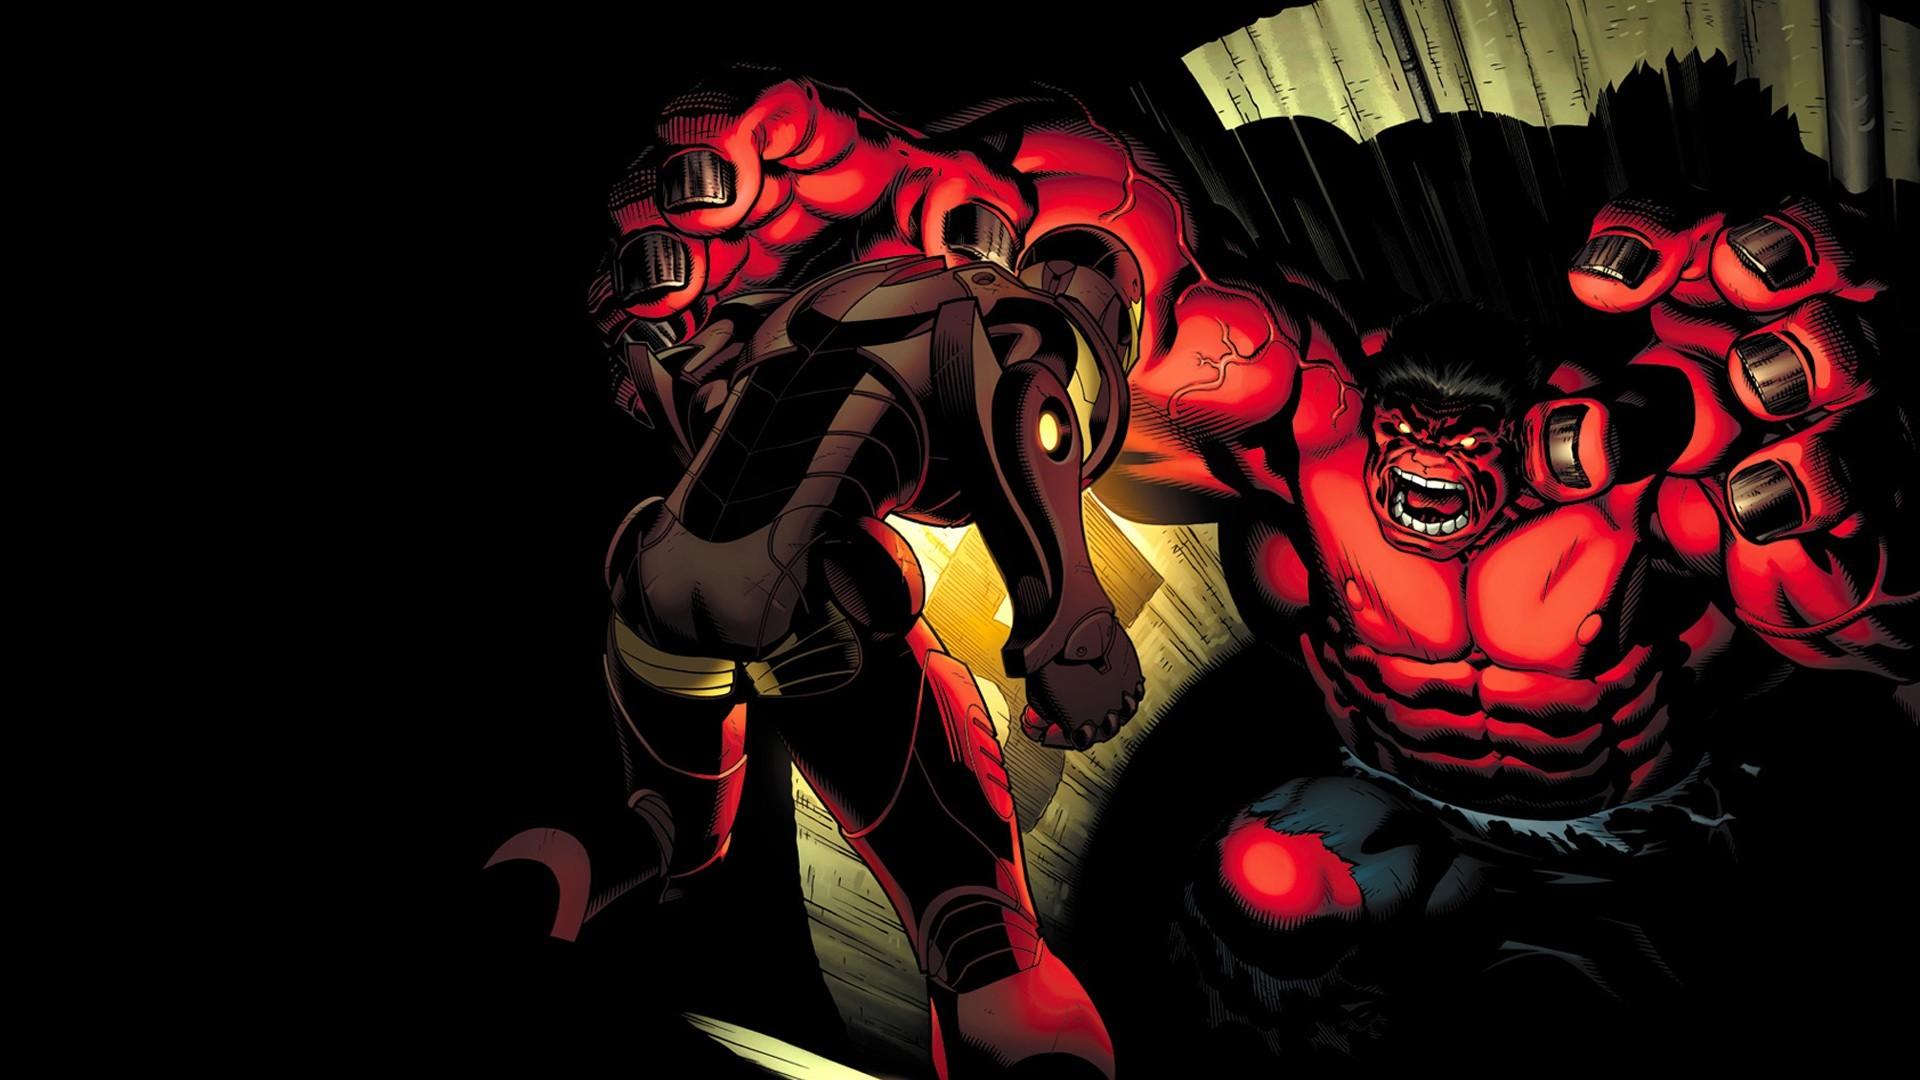 Hulk, Red hulk, Marvel Comics, Illustration, Iron Man